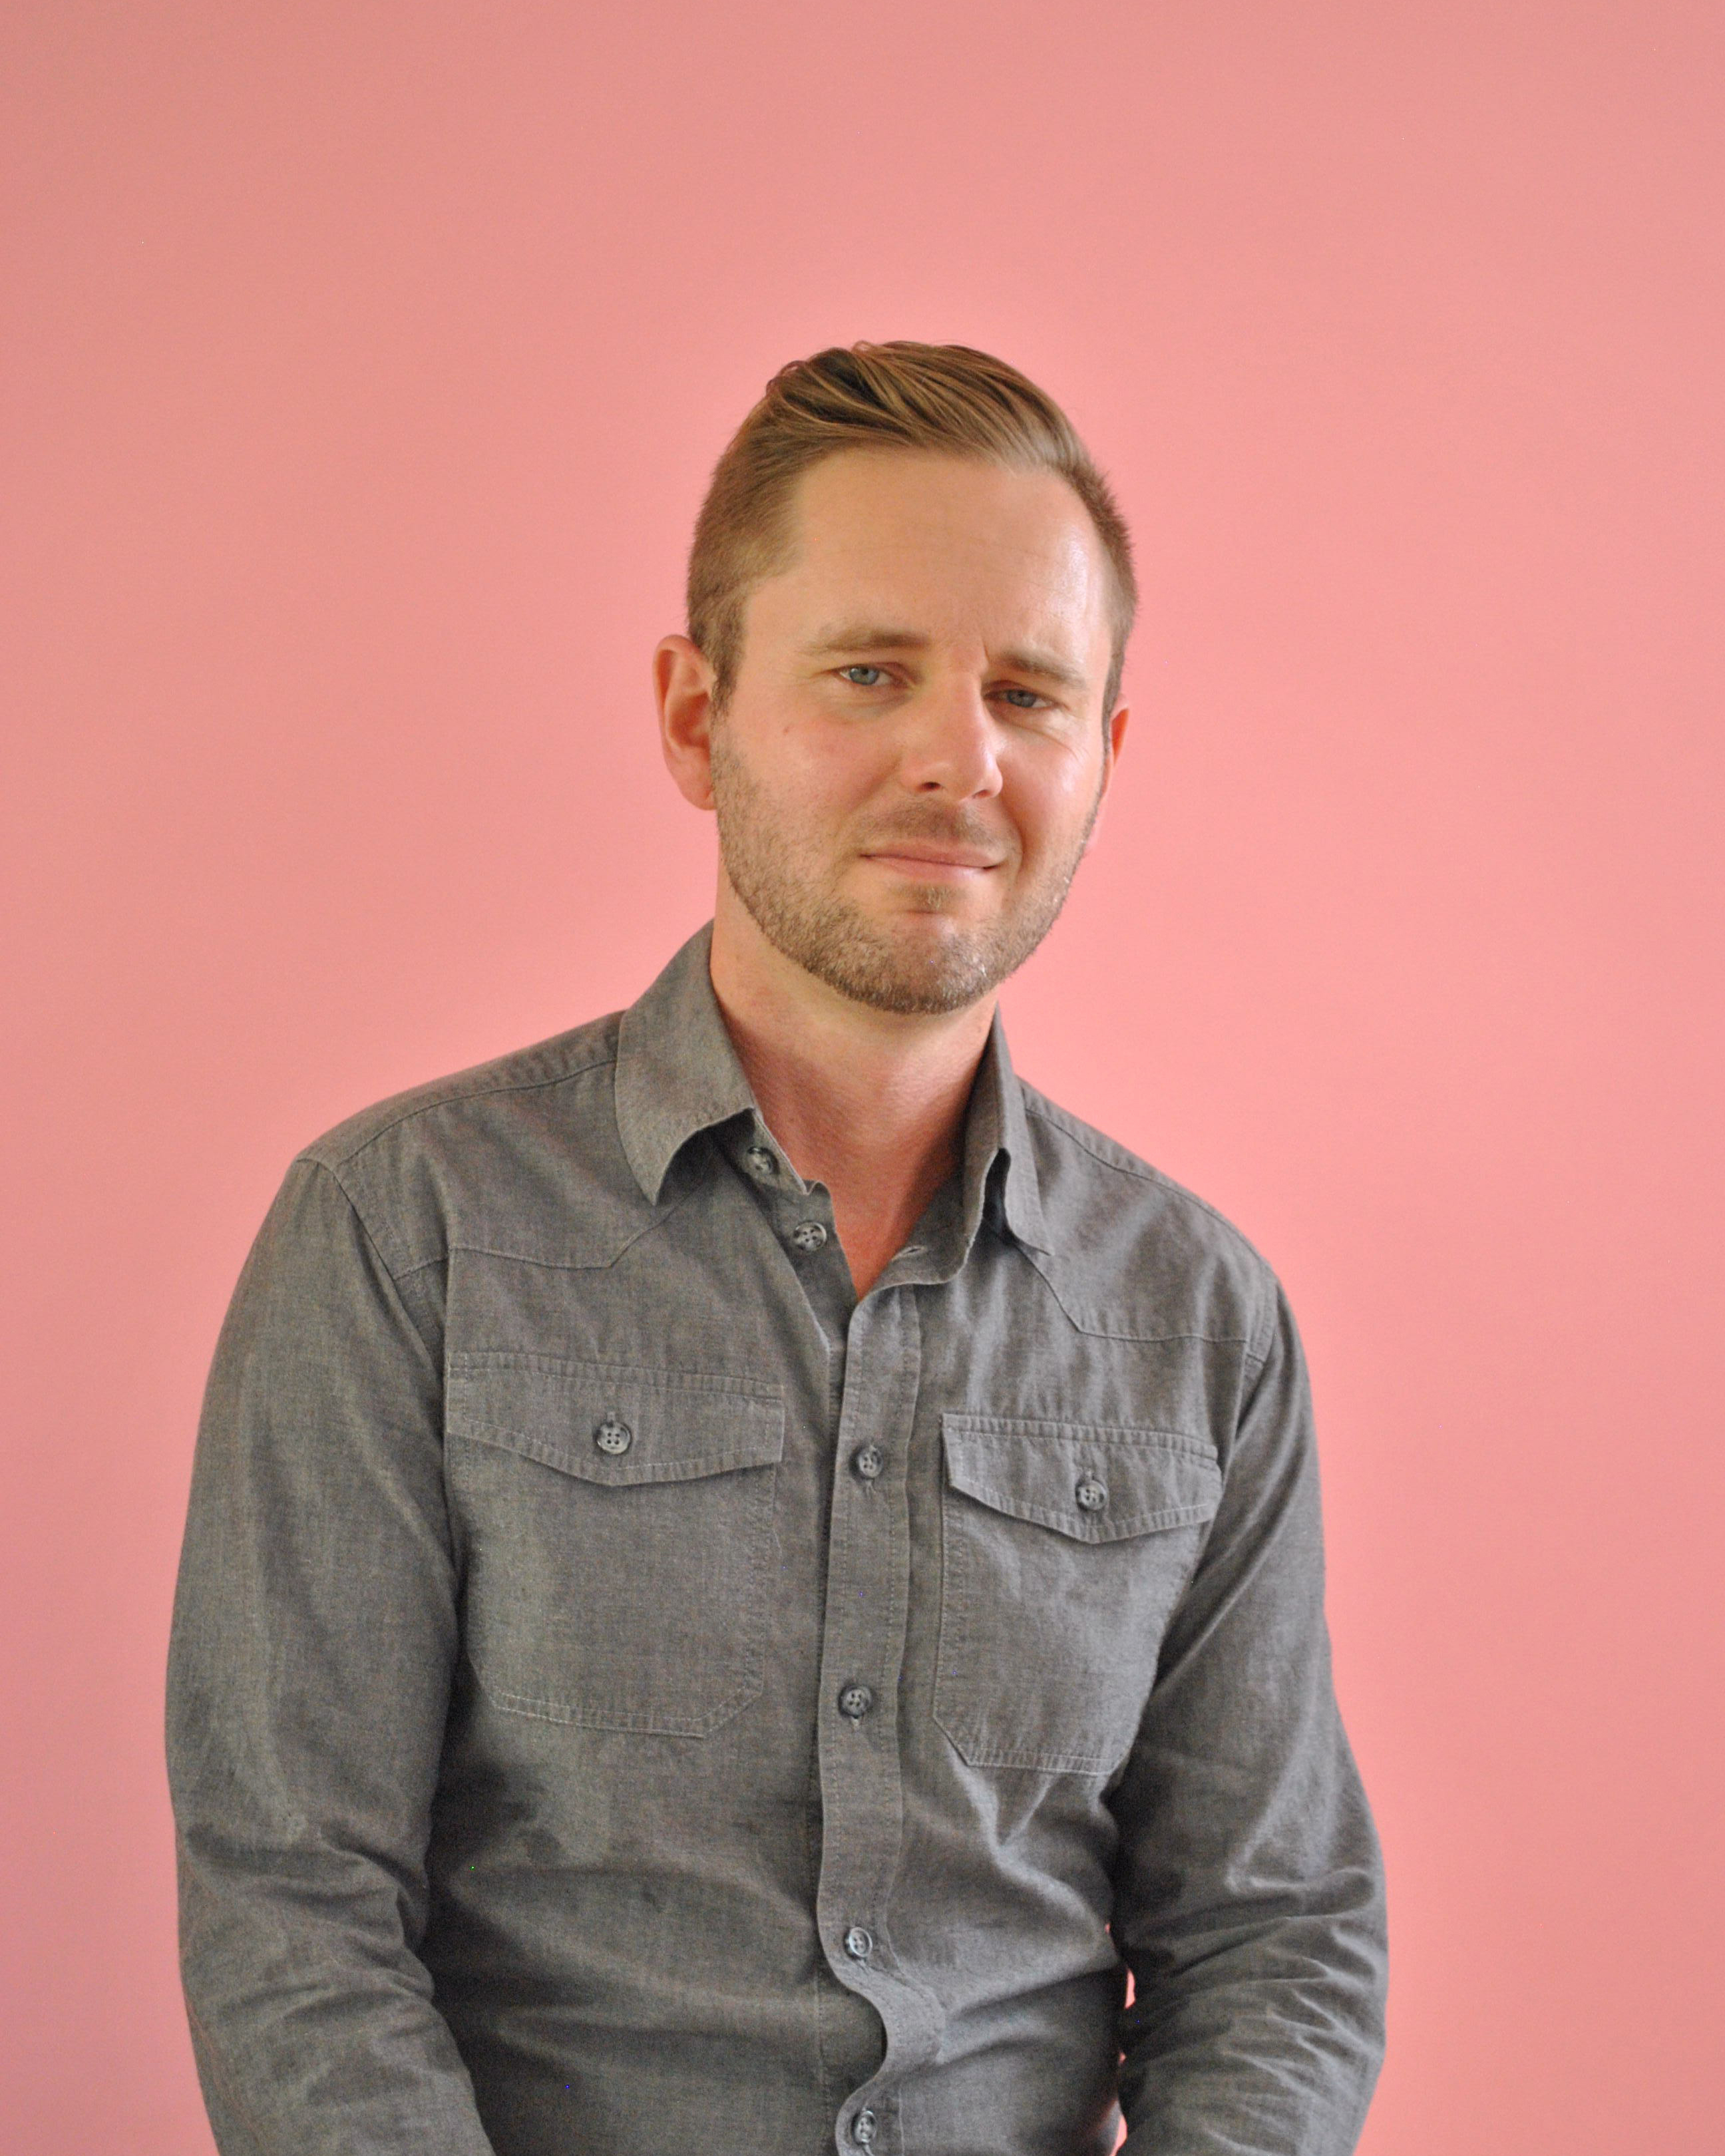 Andrew Barker, Président